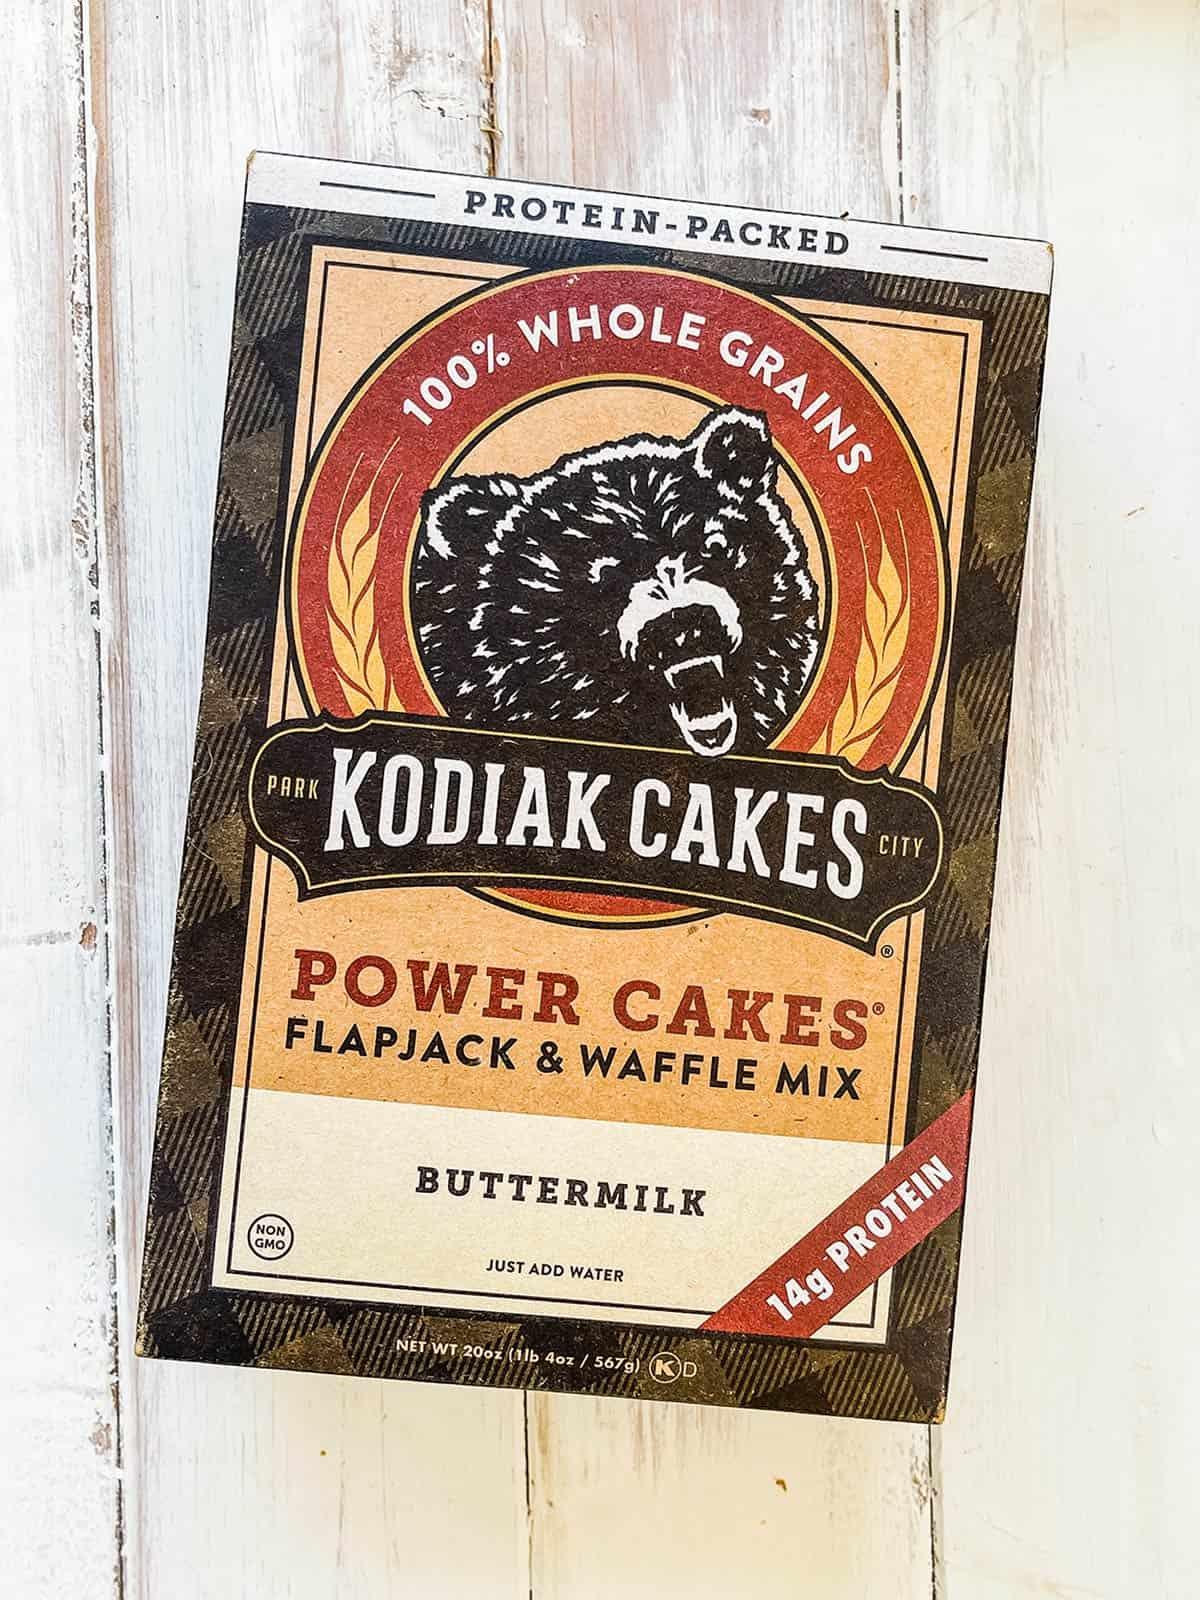 A box of Kodiak Cakes Flapjack and waffle mix.